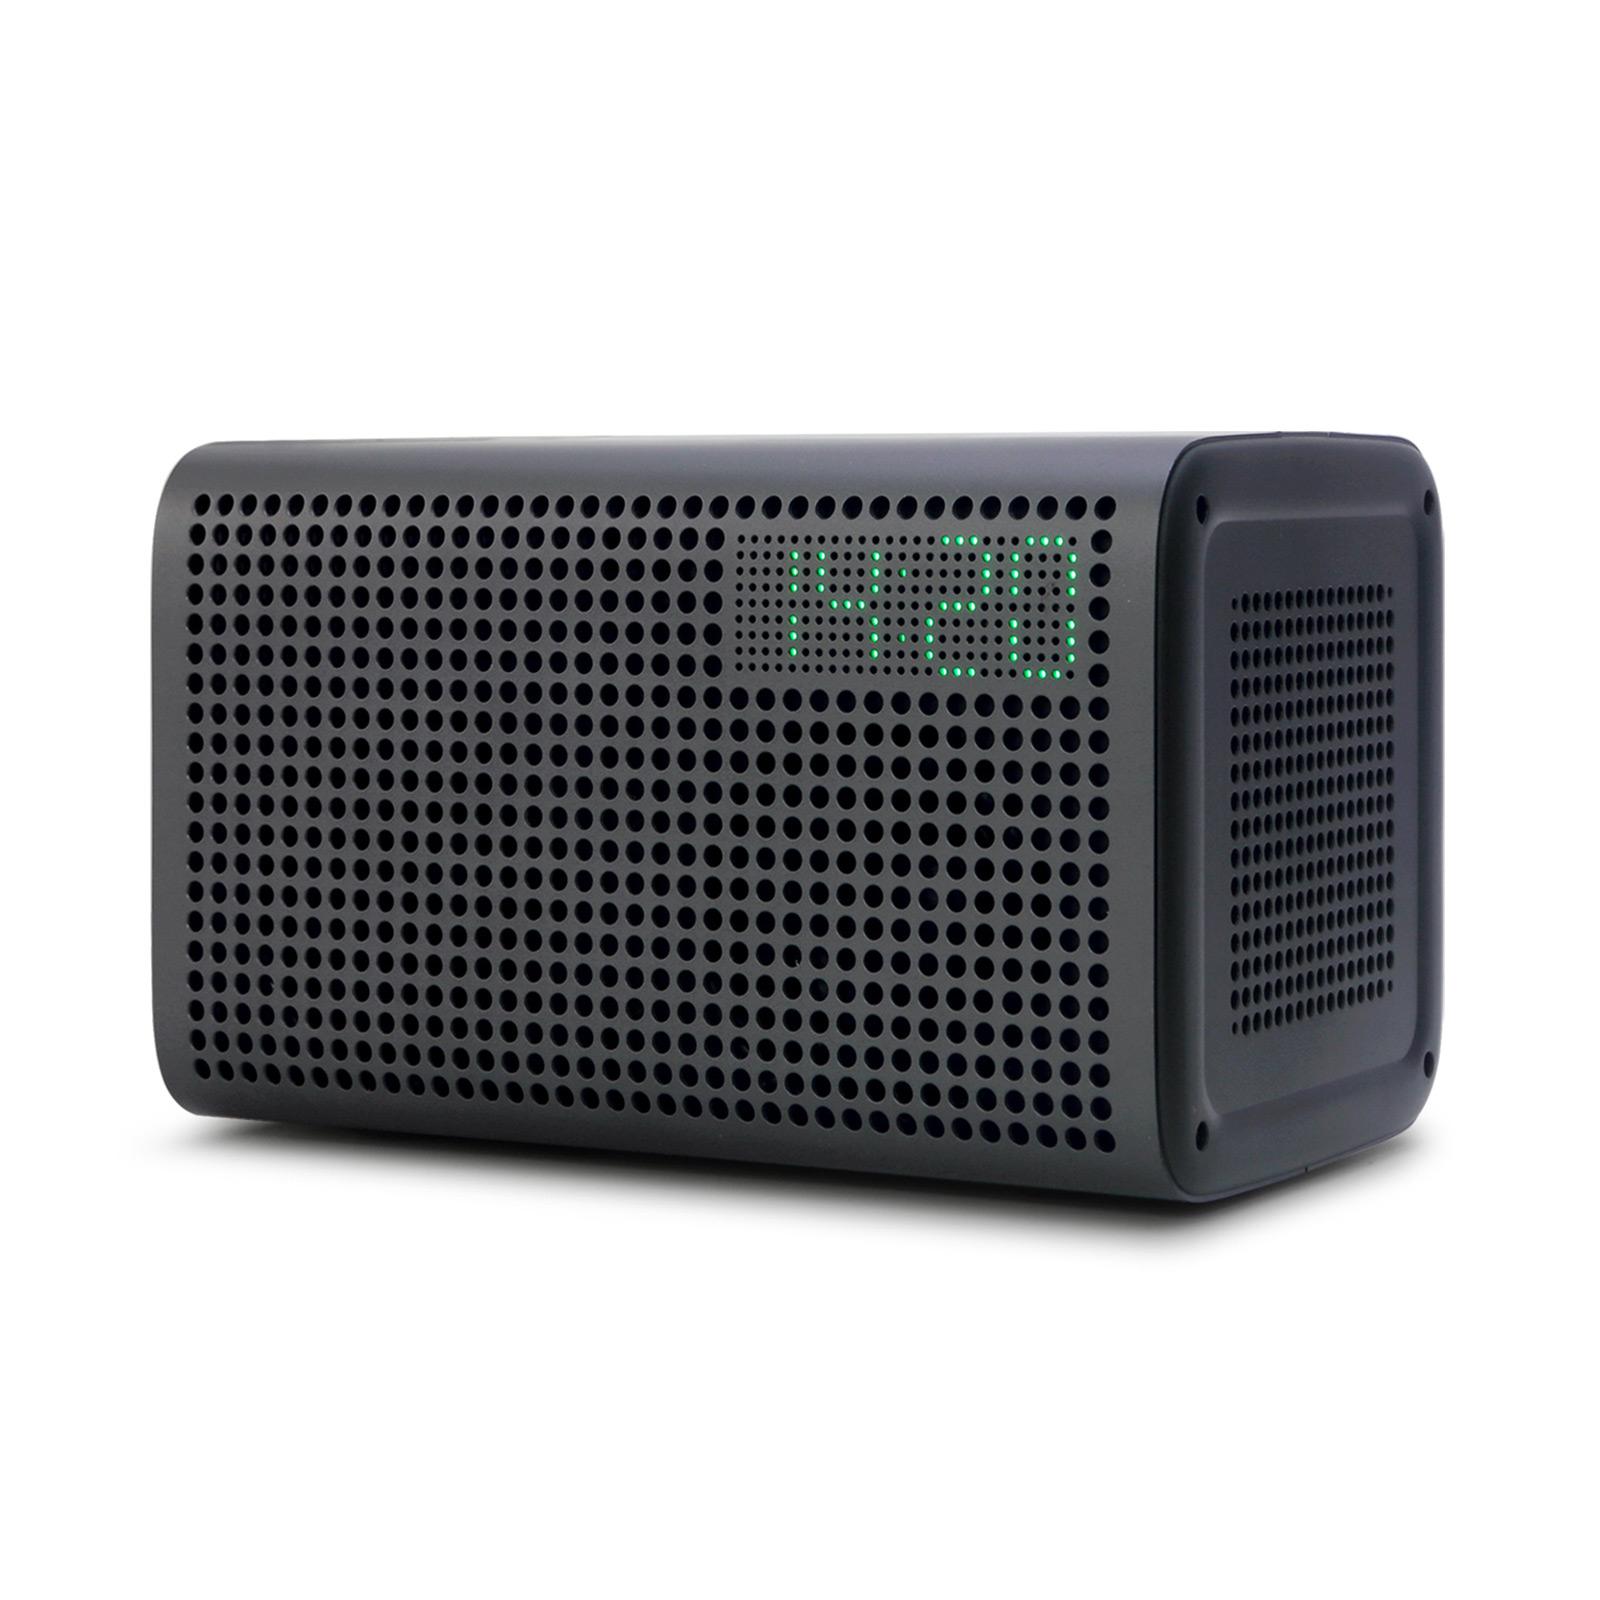 GGMM E3 Bluetooth WiFi Speaker w/ Alexa built in 20w - $55.99 + free shipping